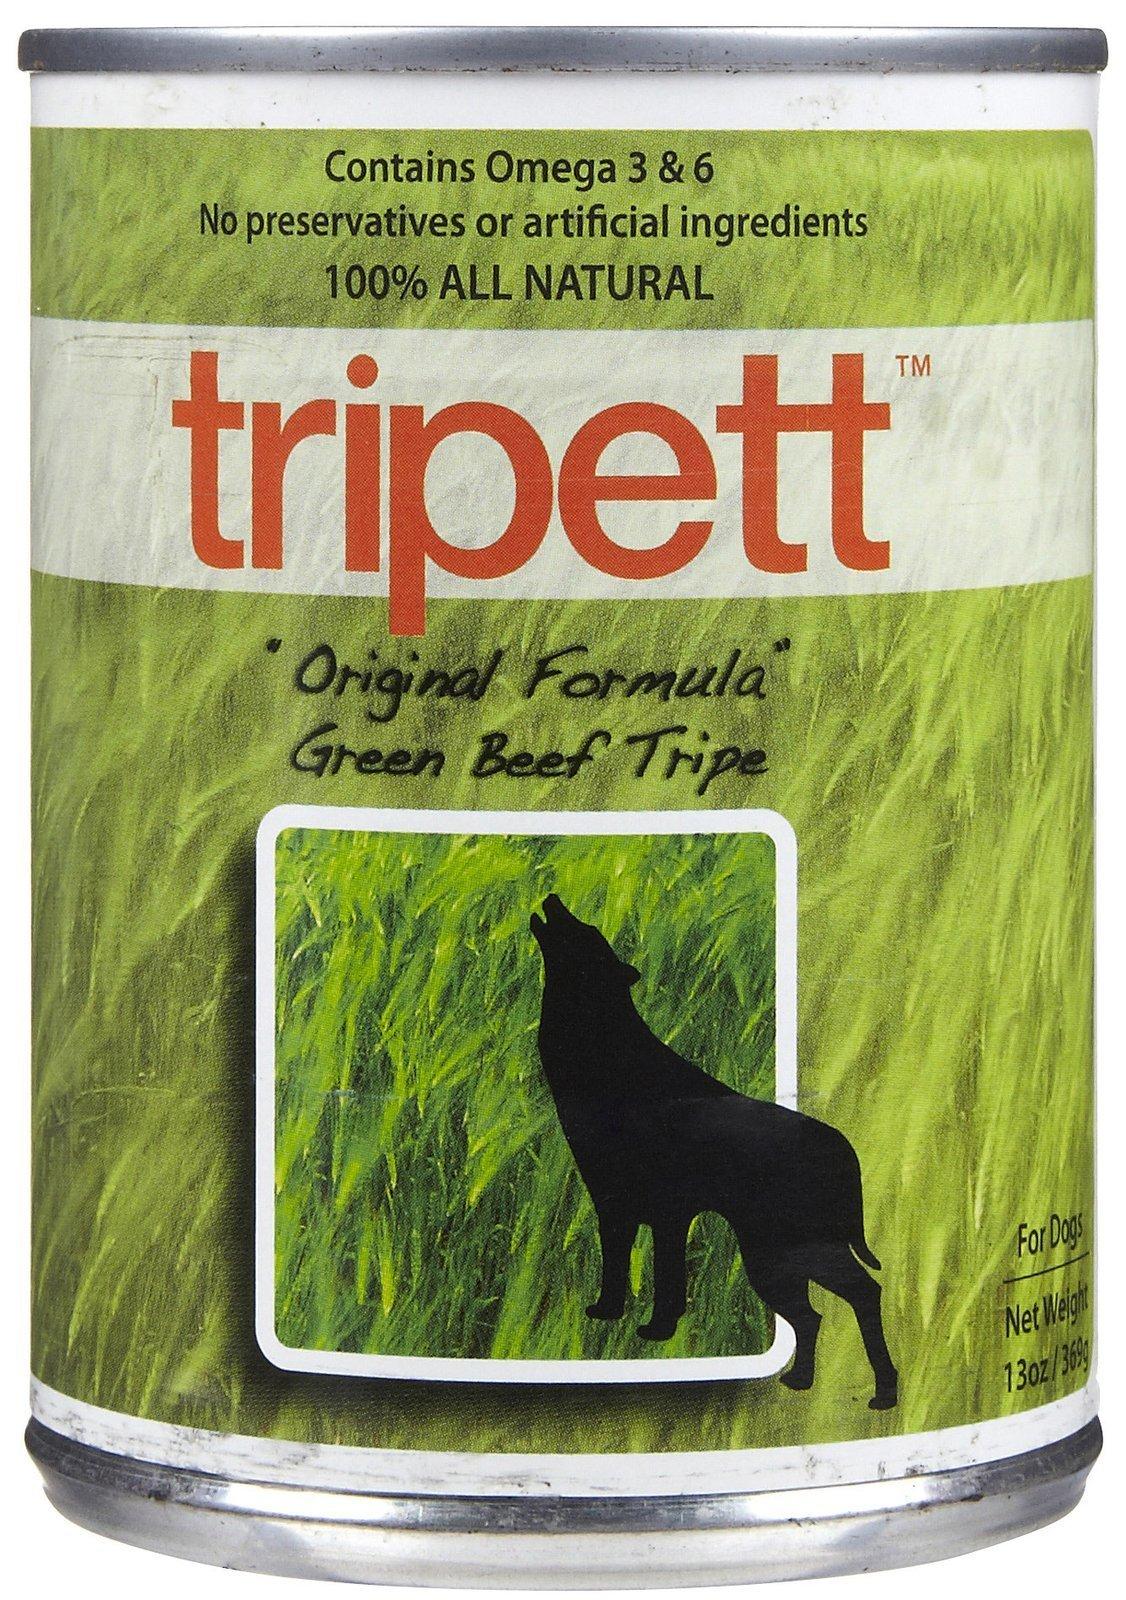 Tripett Original Formula Green Beef Tripe Dog Food, 13 oz cans, Pack of 12 by Tripett